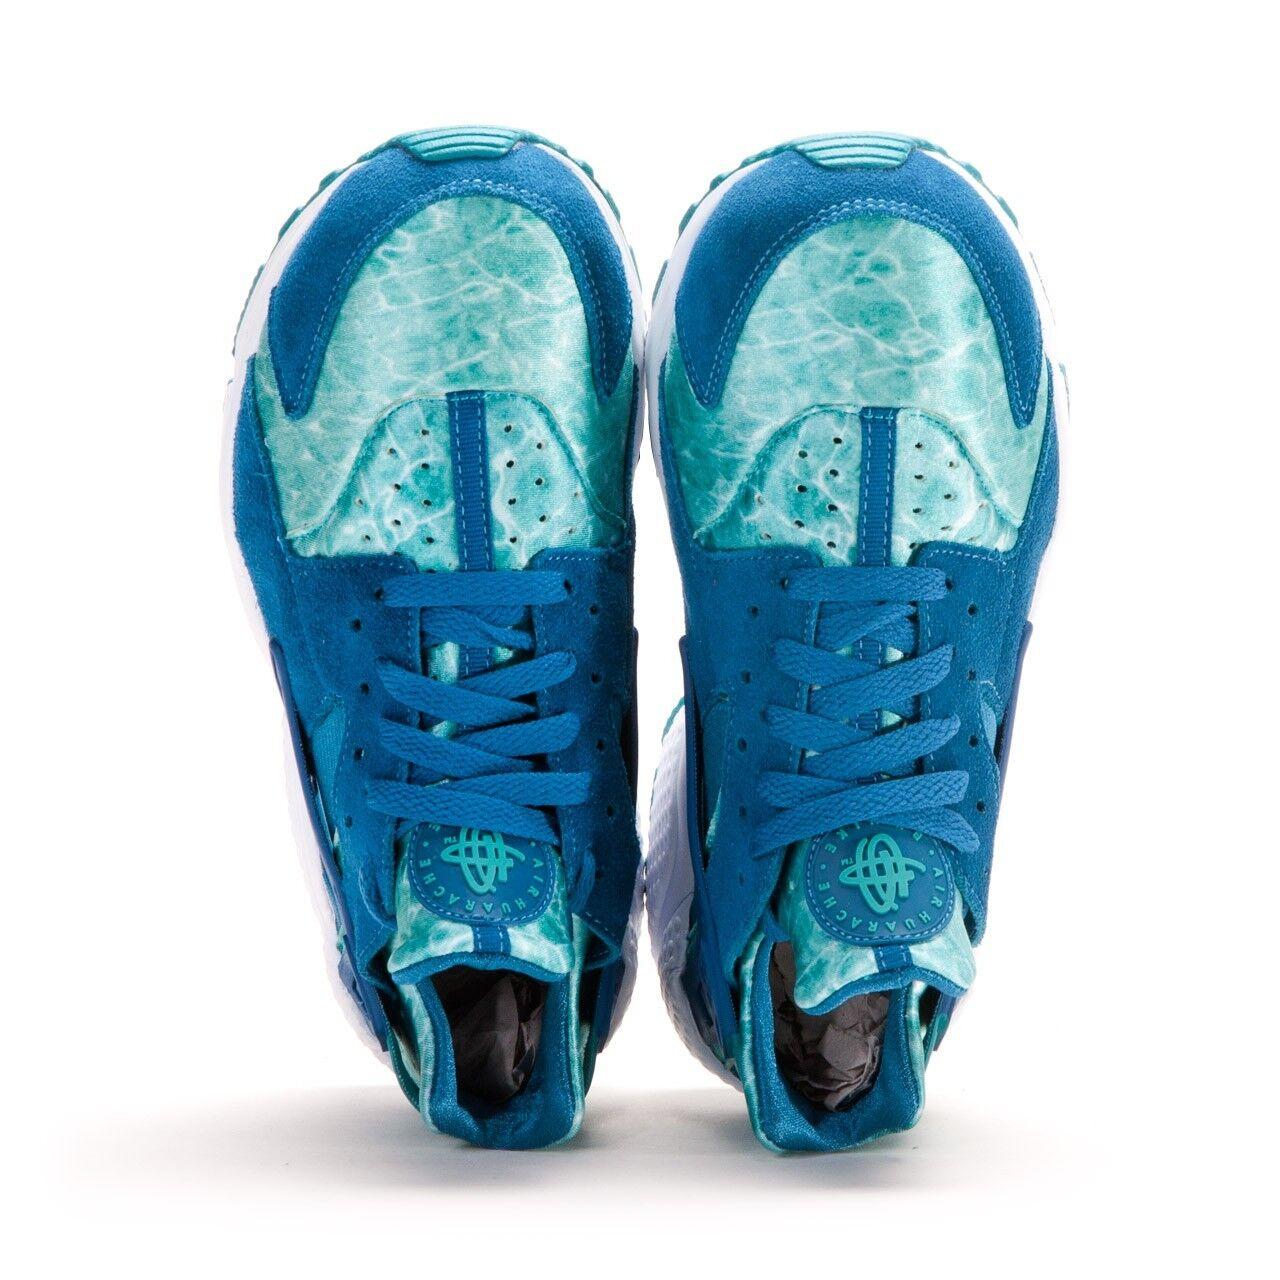 Nike air huarache lauf pa pa pa grne abgrund turbo grne obersten 8 318429-331 begrenzt 57d551